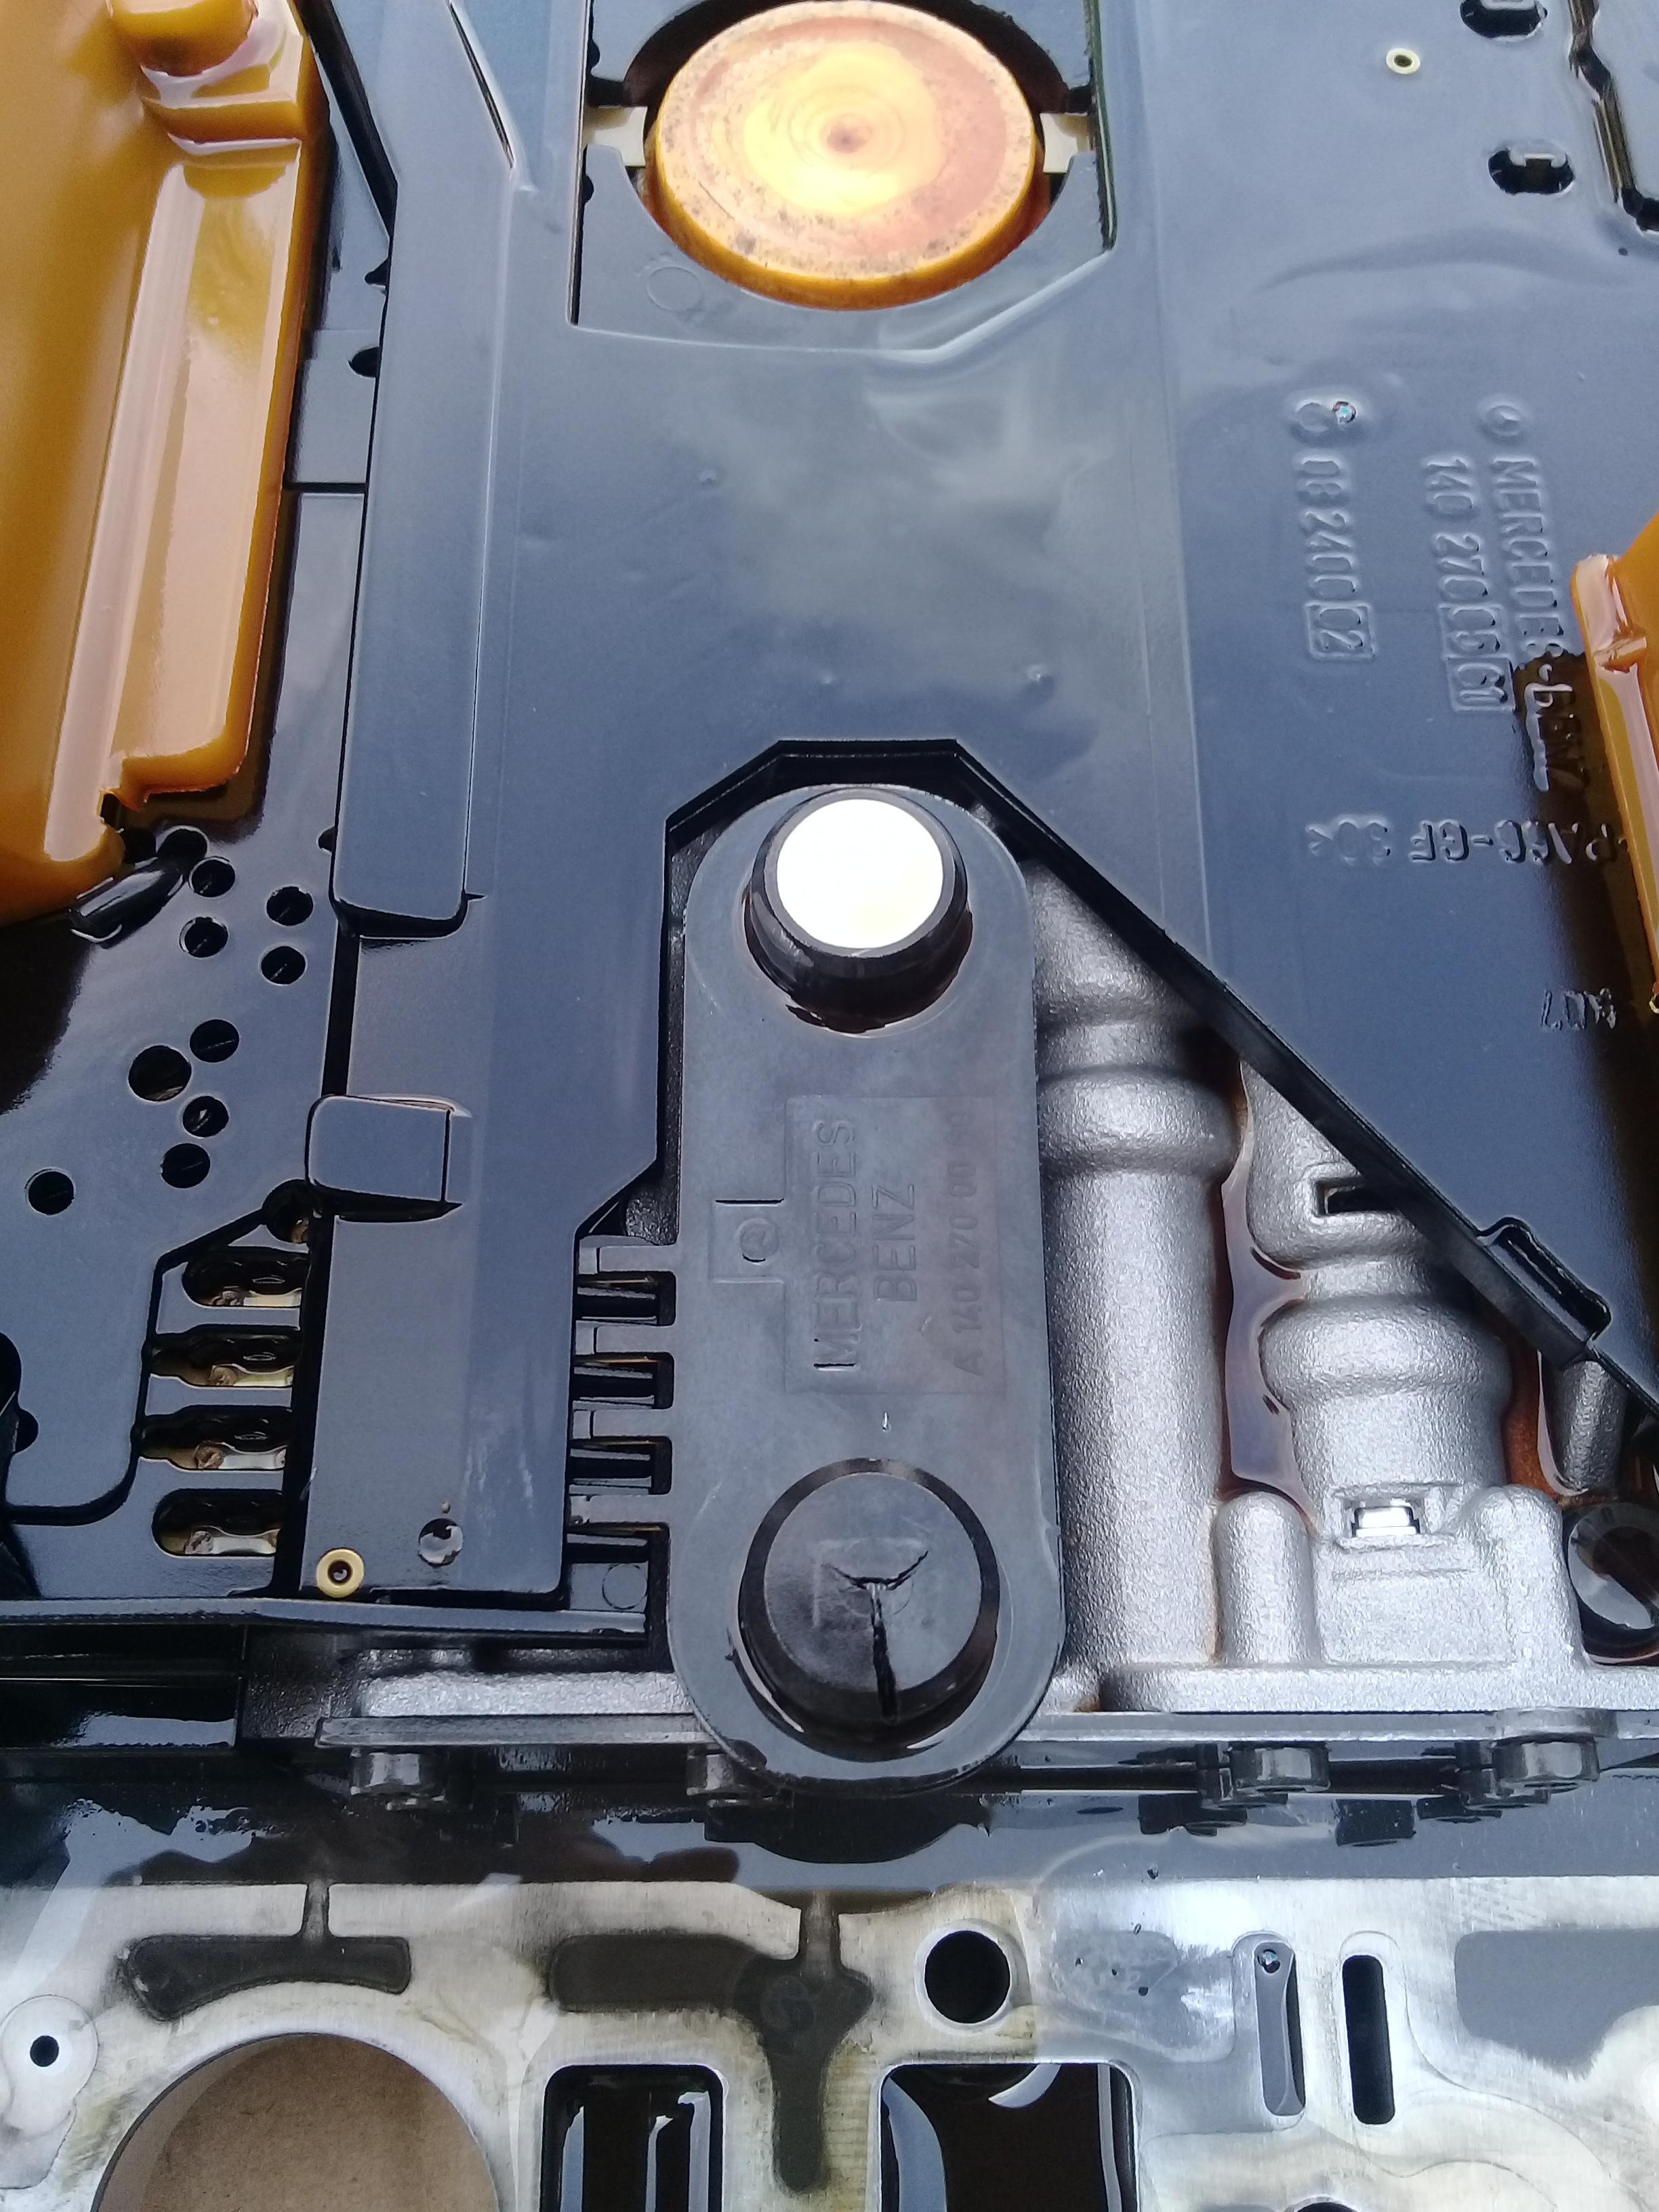 Conductor Plates Leaks Oil - Mariagegironde